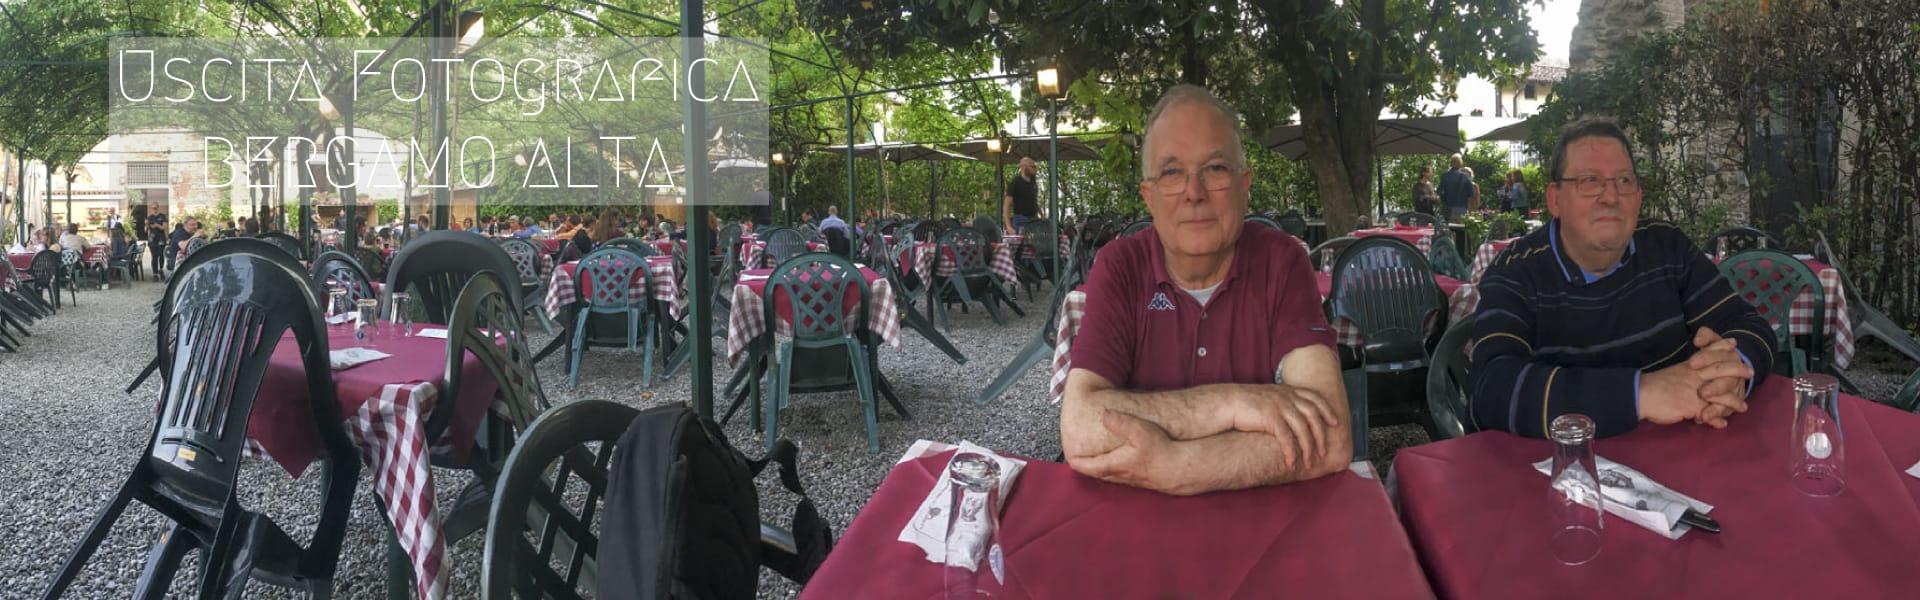 Reportage: NOTTURNA A BERGAMO ALTA